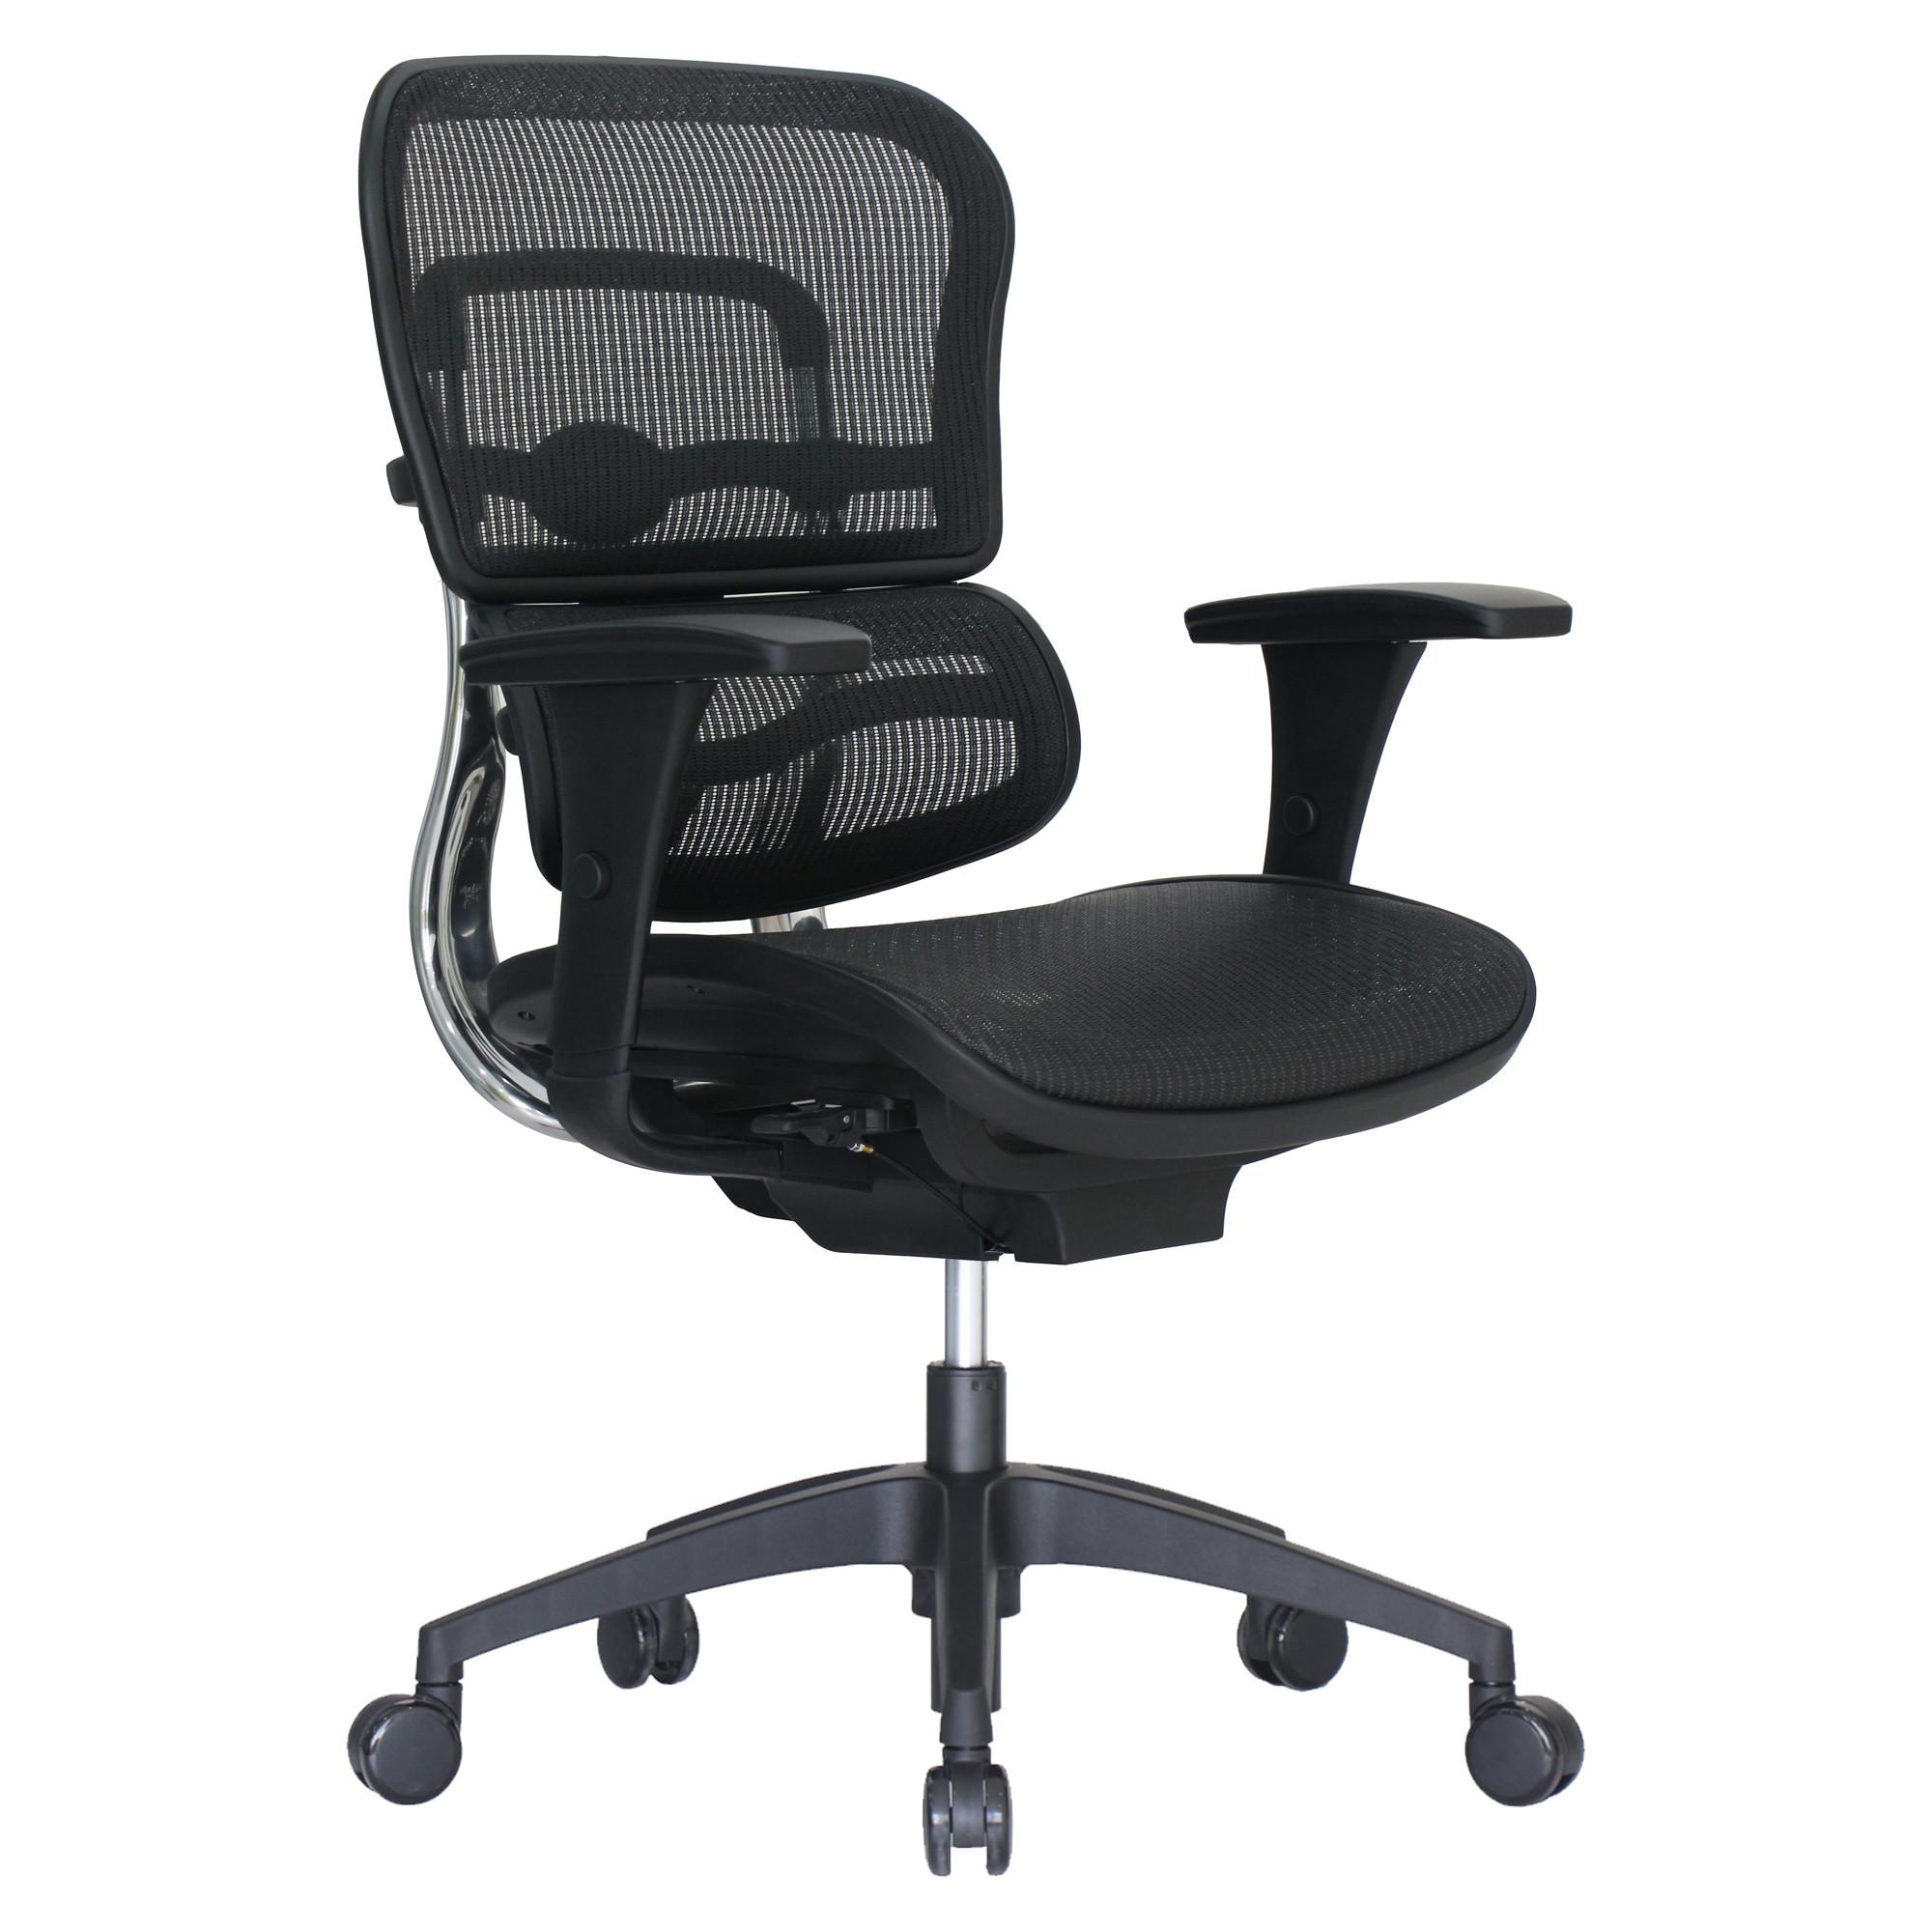 Ergonomic Desk Chair Ergonomic fice Chairs Temple Webster